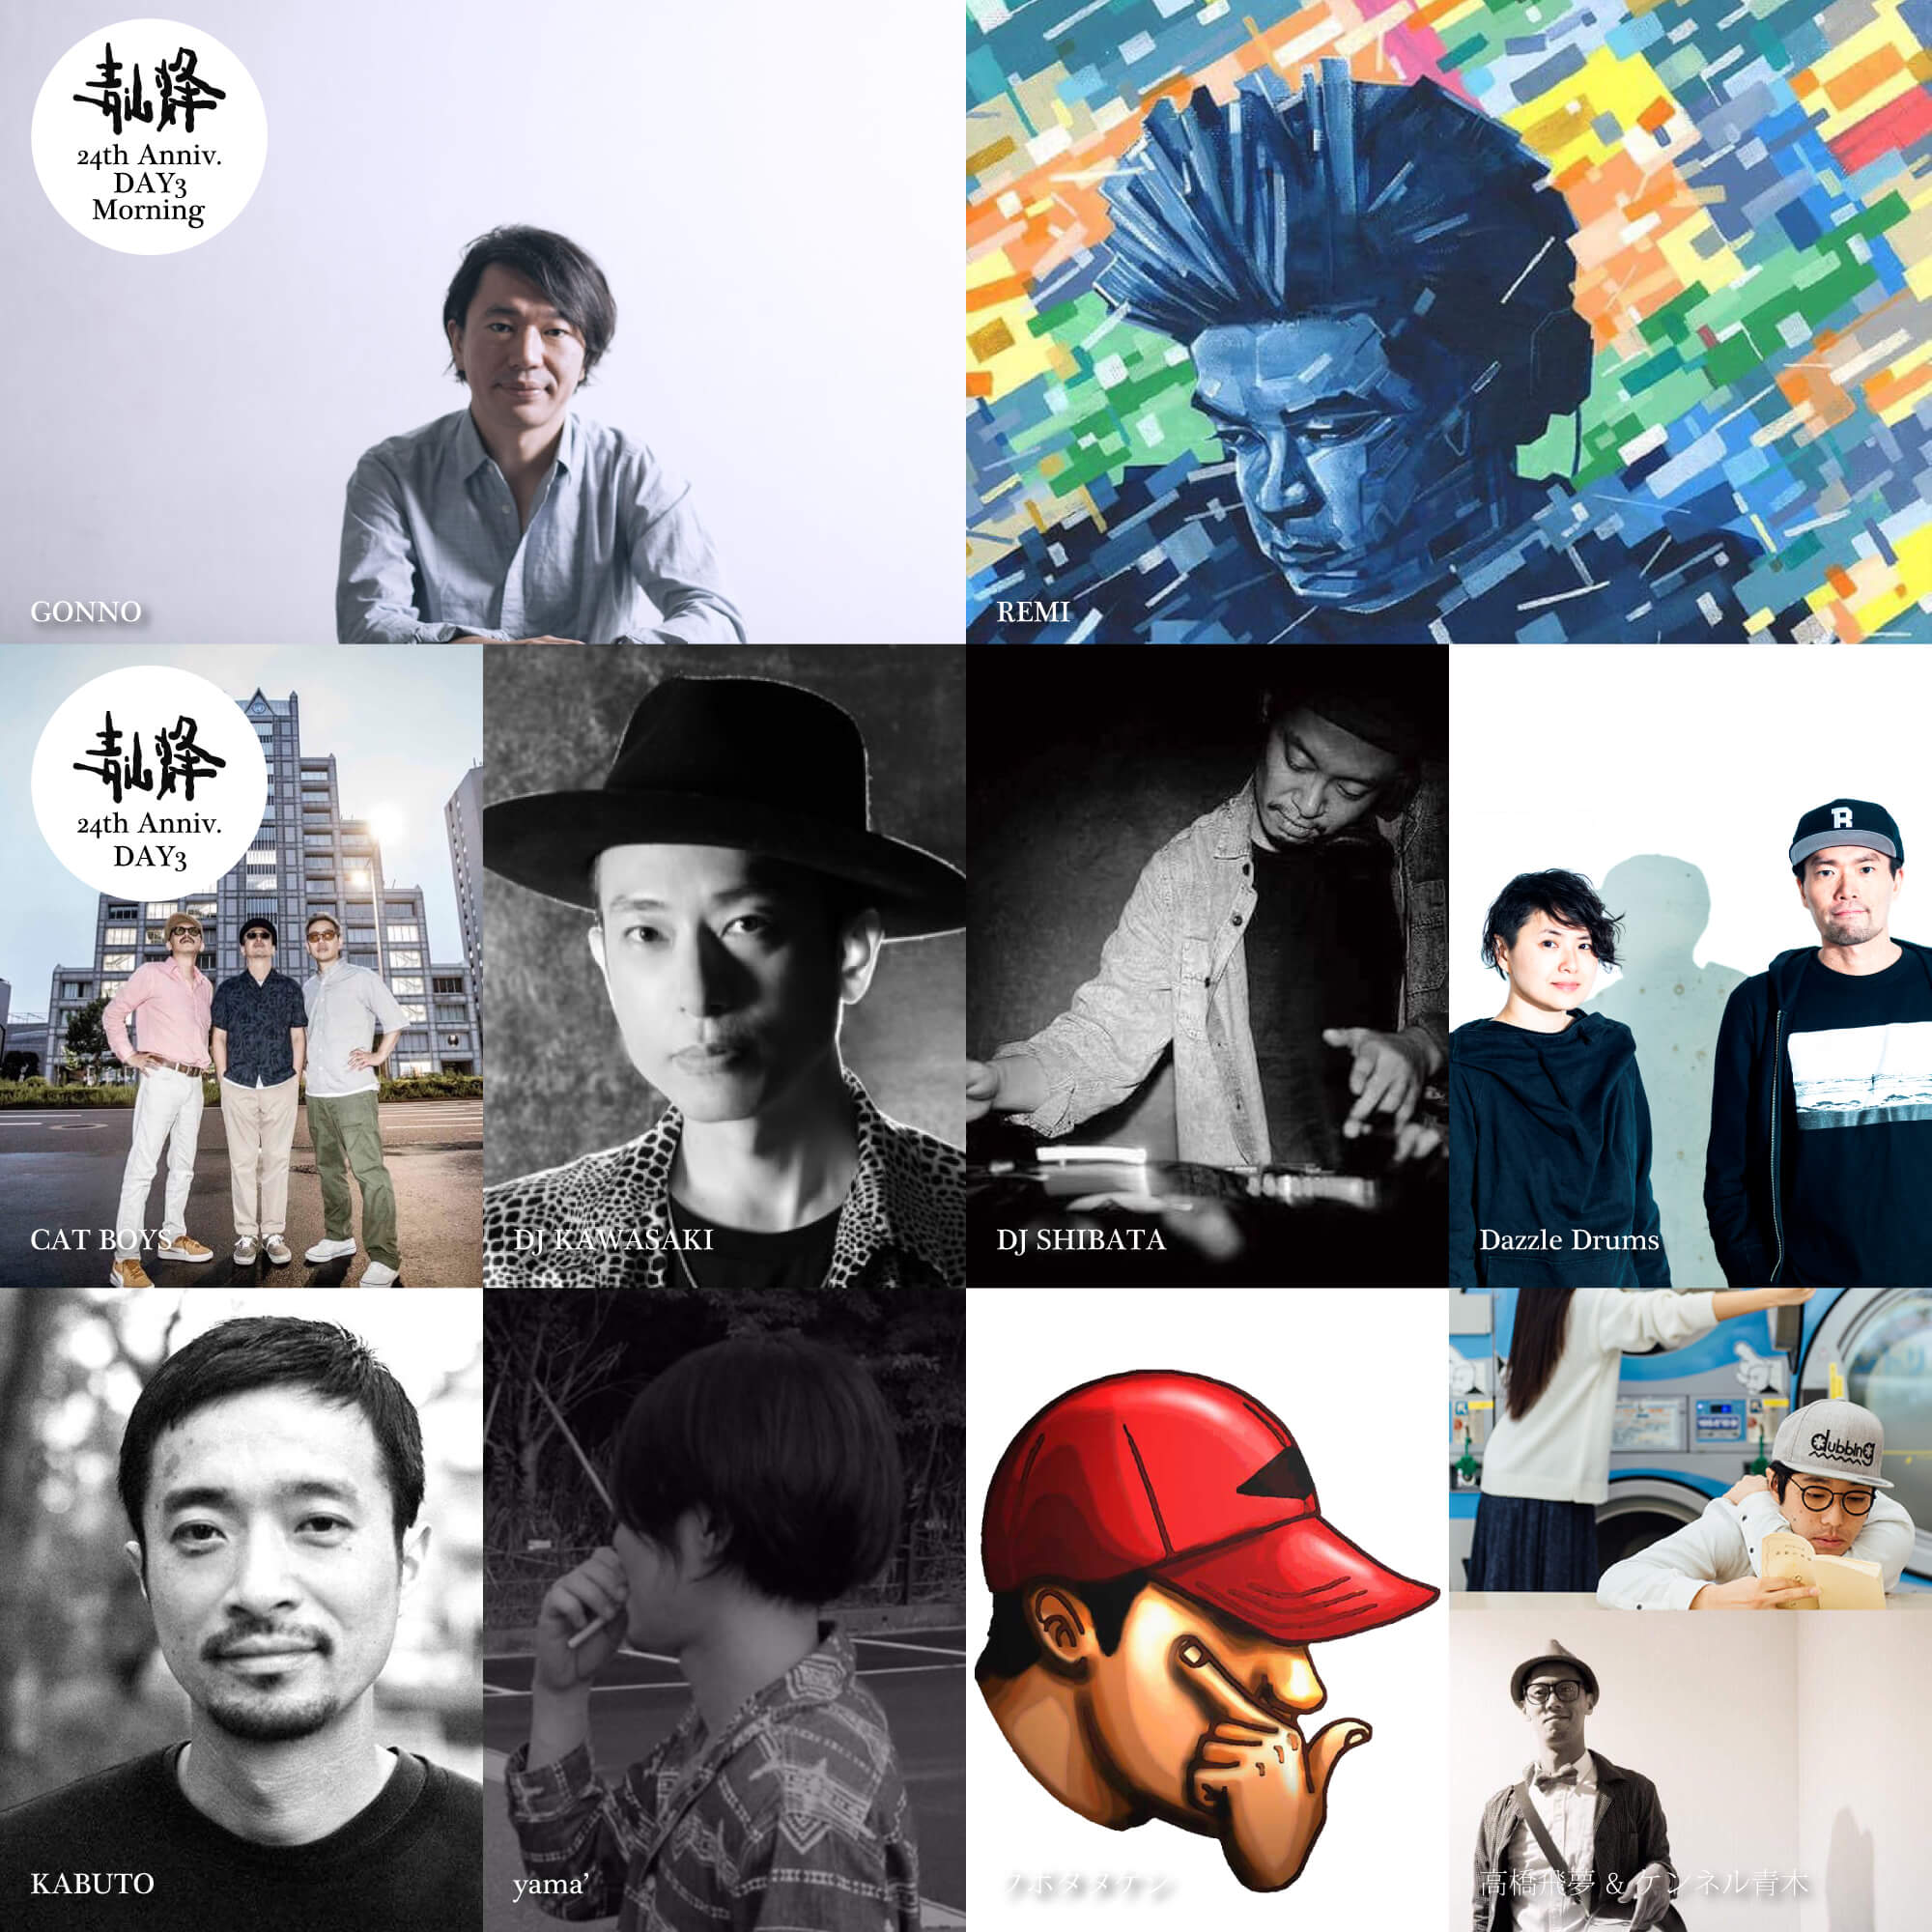 Aoyama Hachi 24th Anniversary Day 3